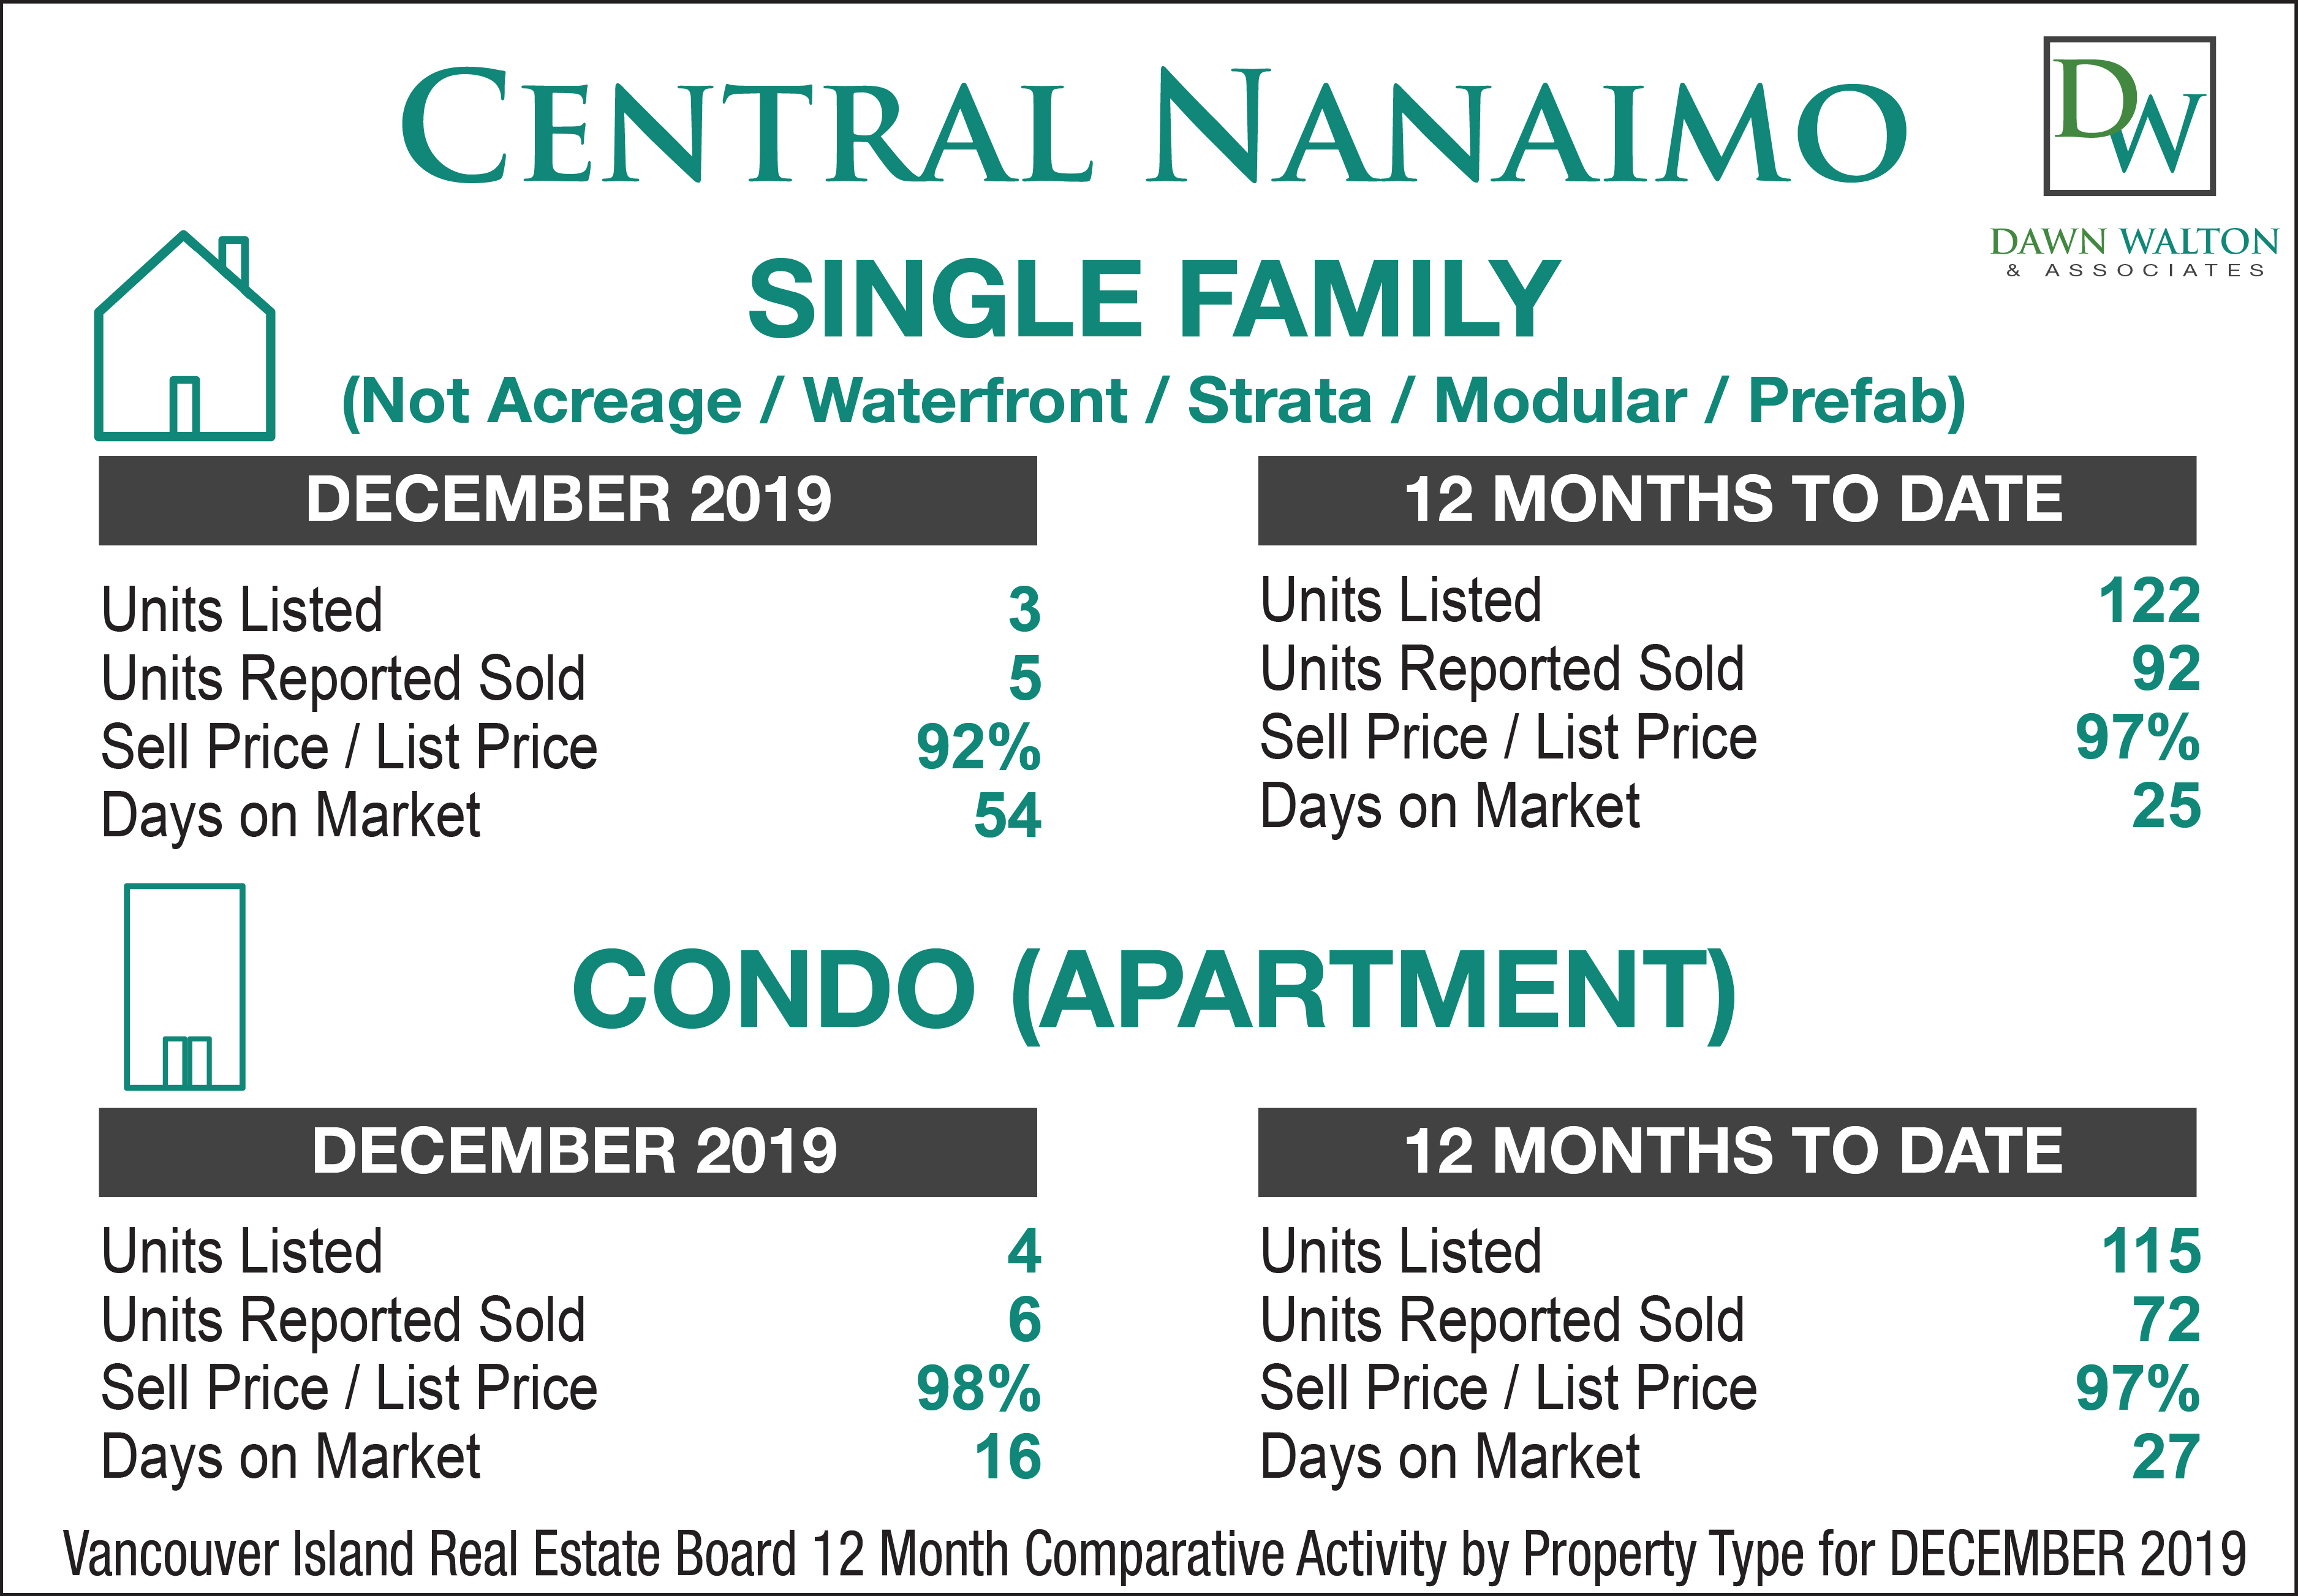 Central Nanaimo Real Estate Market Stats December  2019 - Nanaimo Realtor Dawn Walton